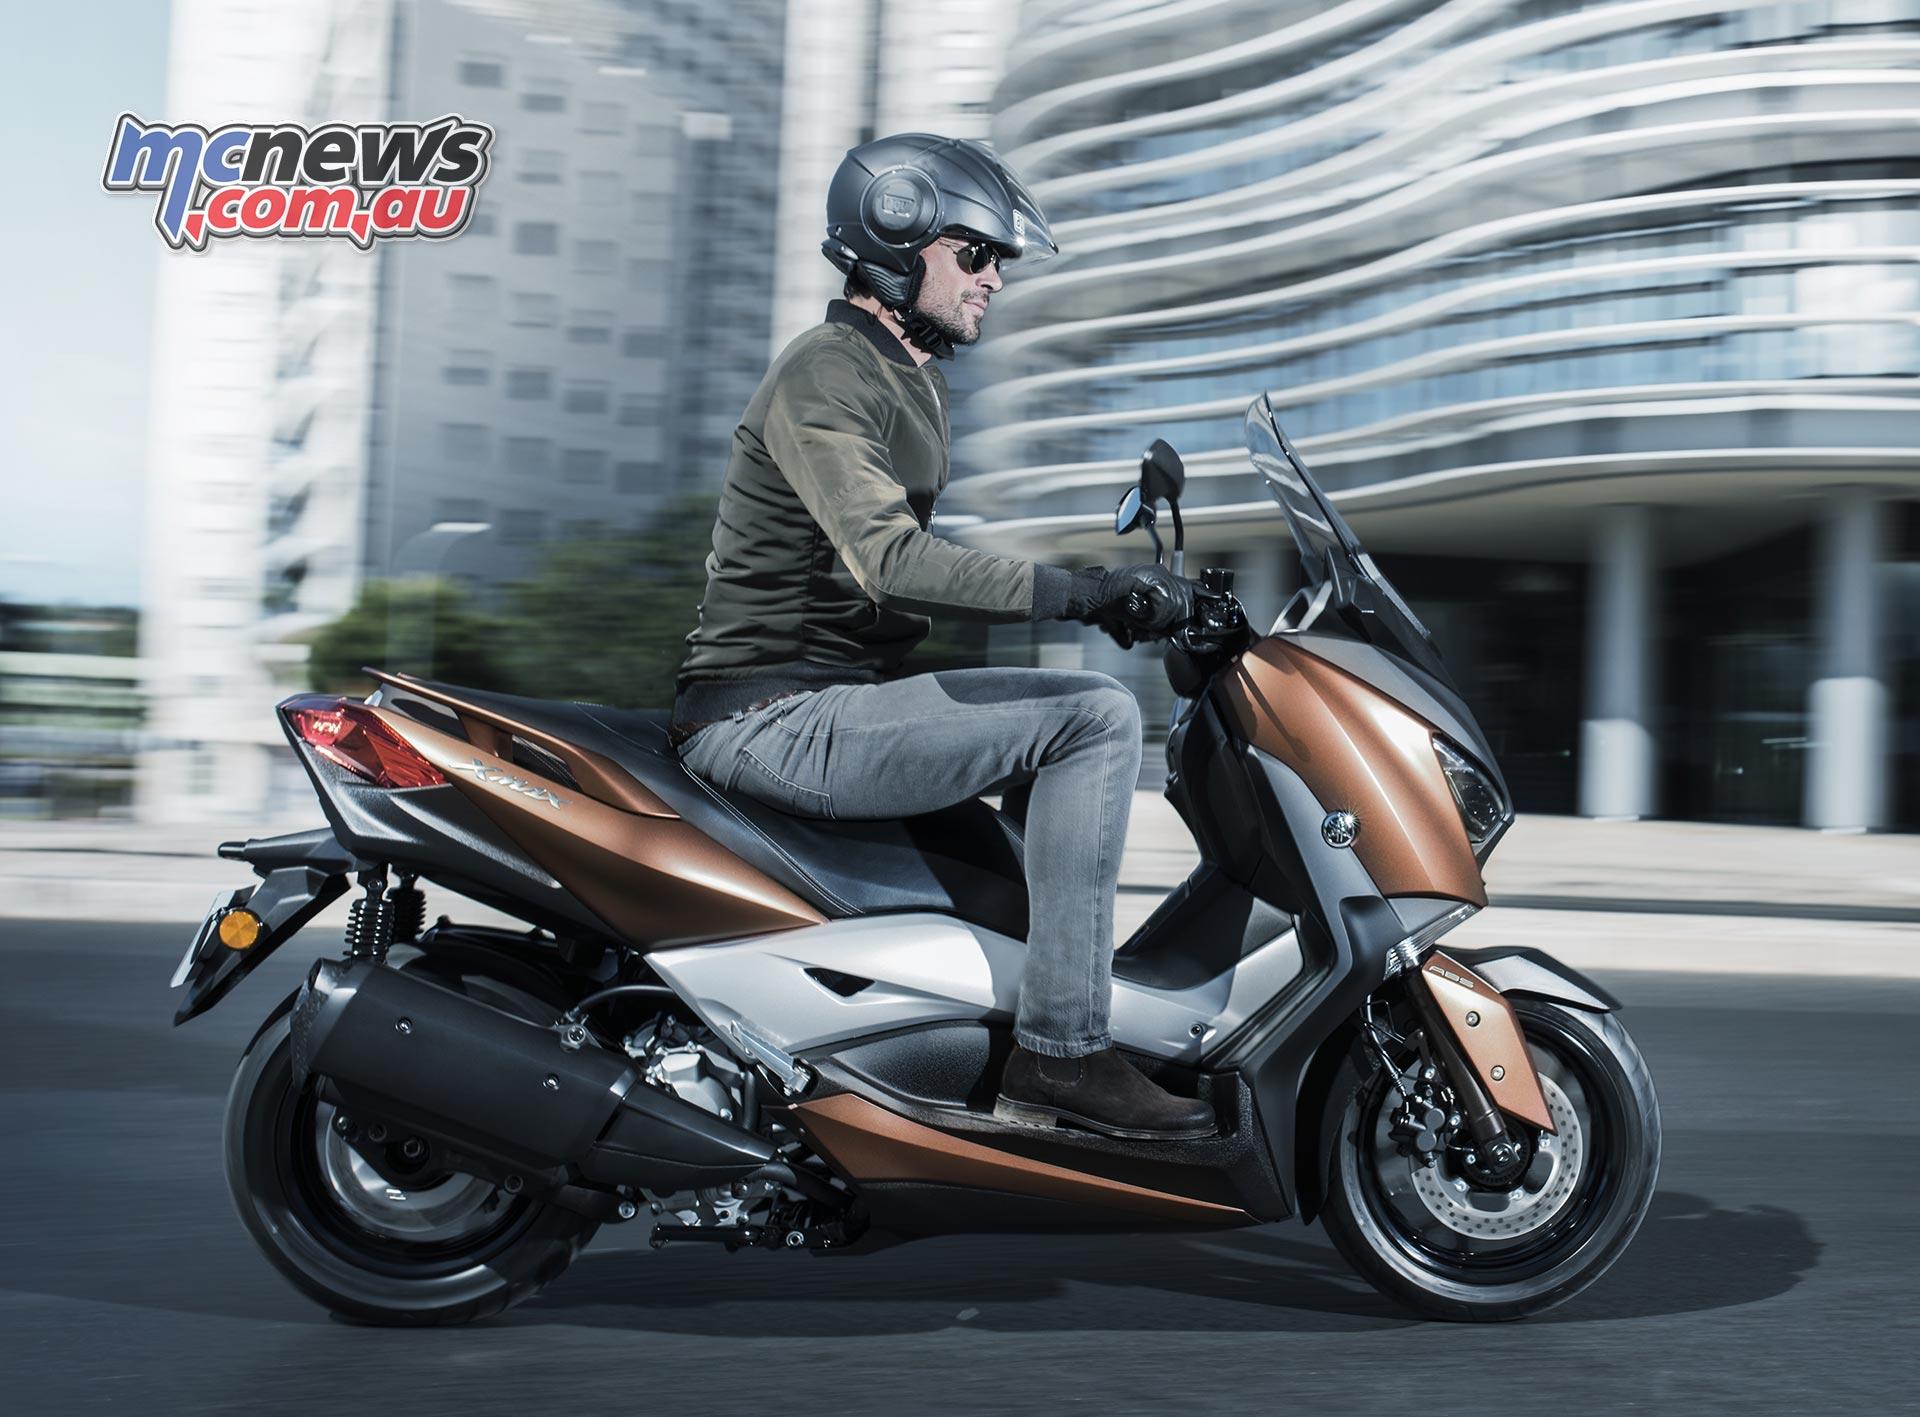 2017 Yamaha X-Max 300   New big scoot from Yamaha   MCNews com au